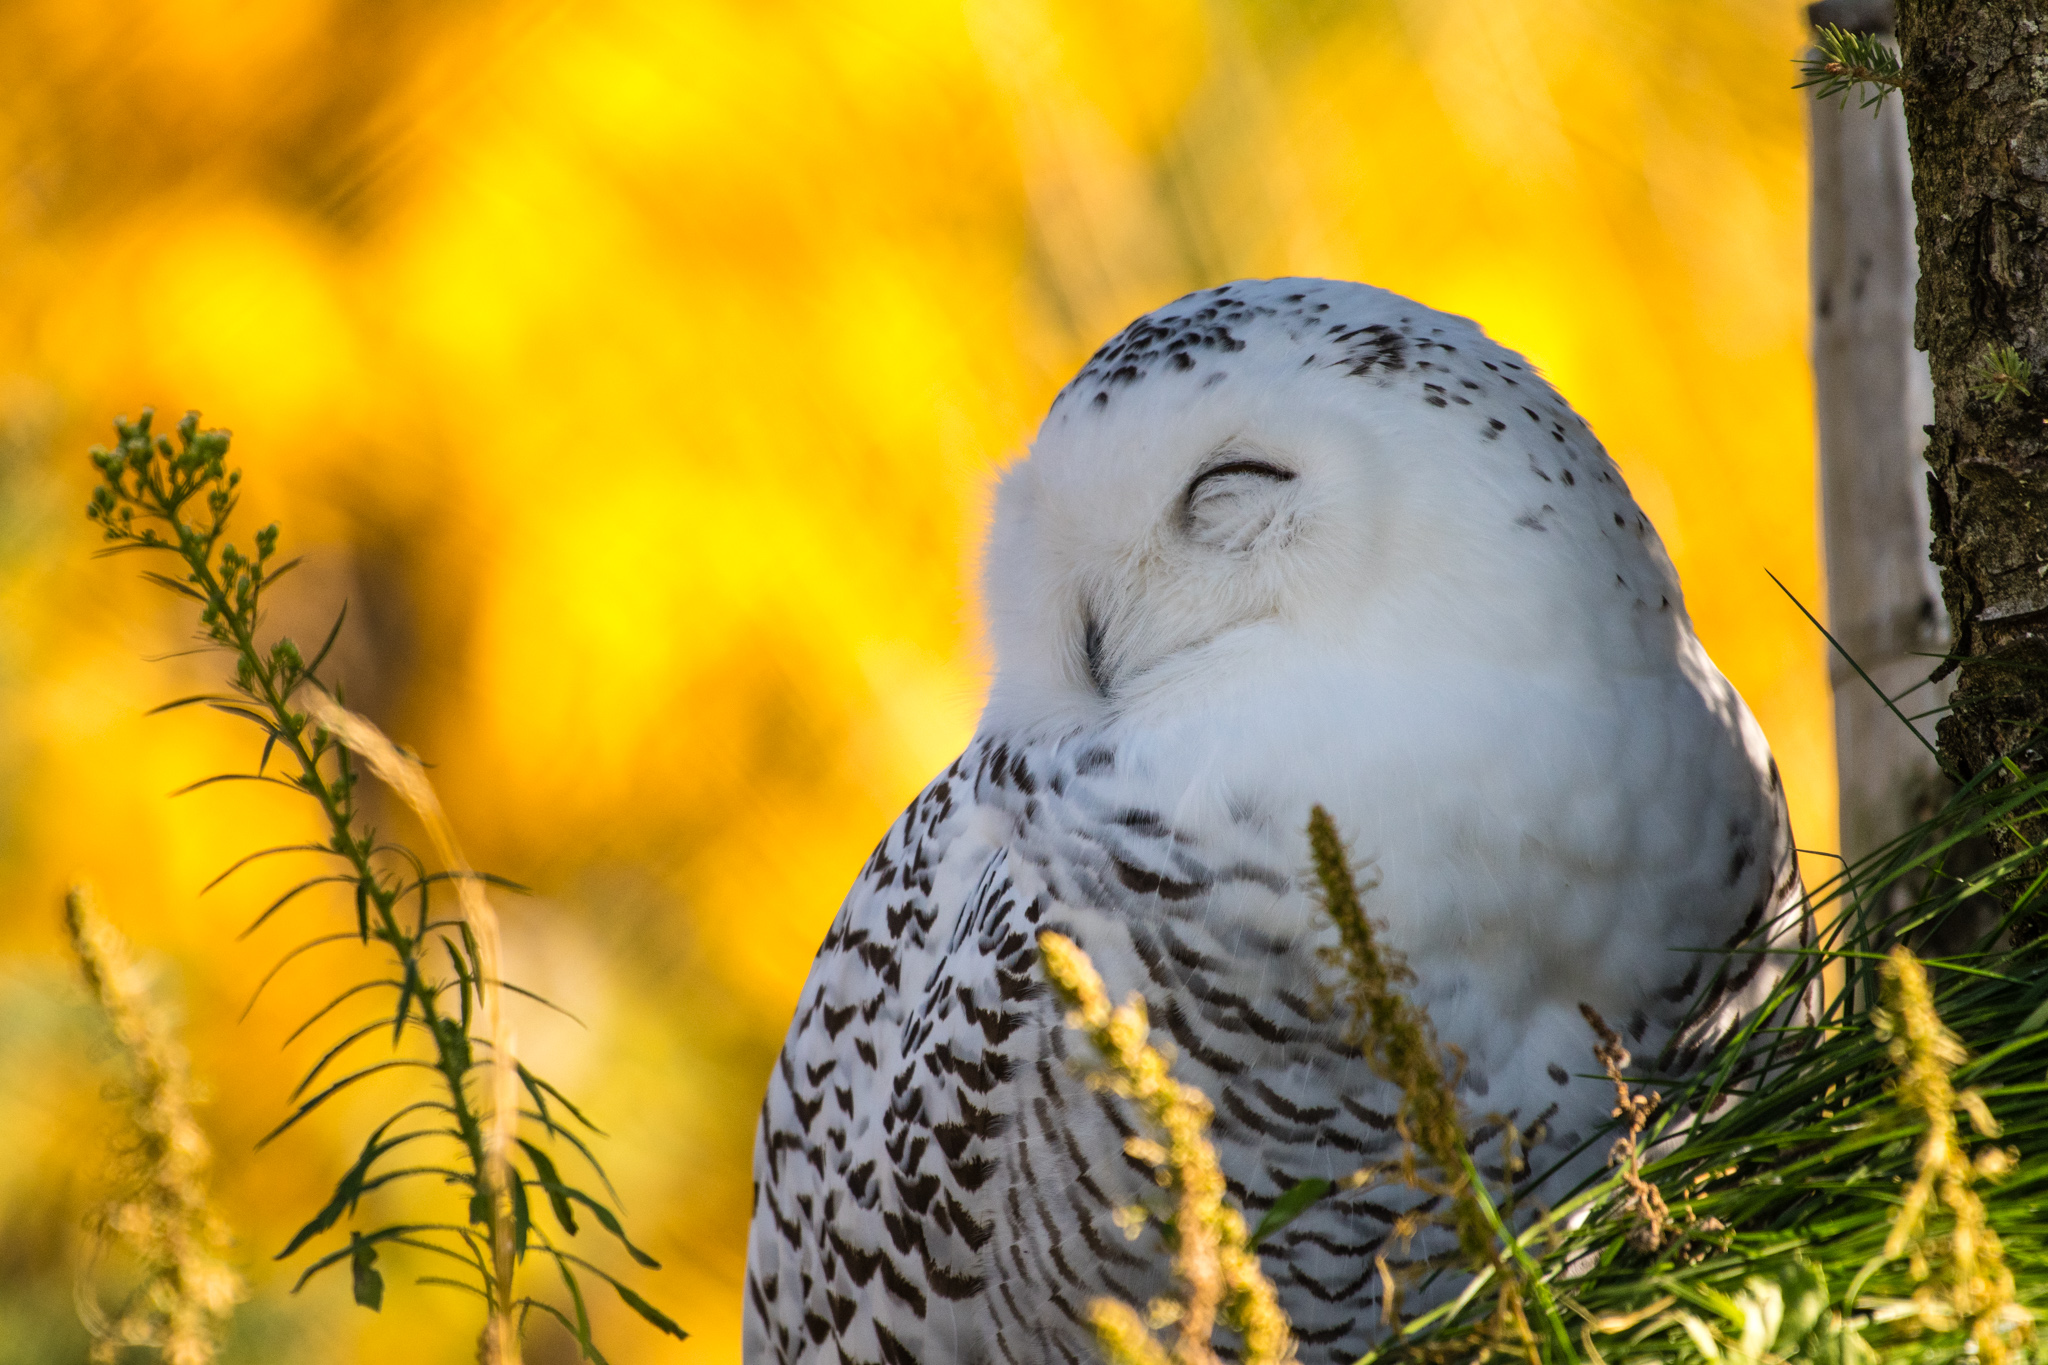 Arctic owl enjoying the usually warm Autumn.